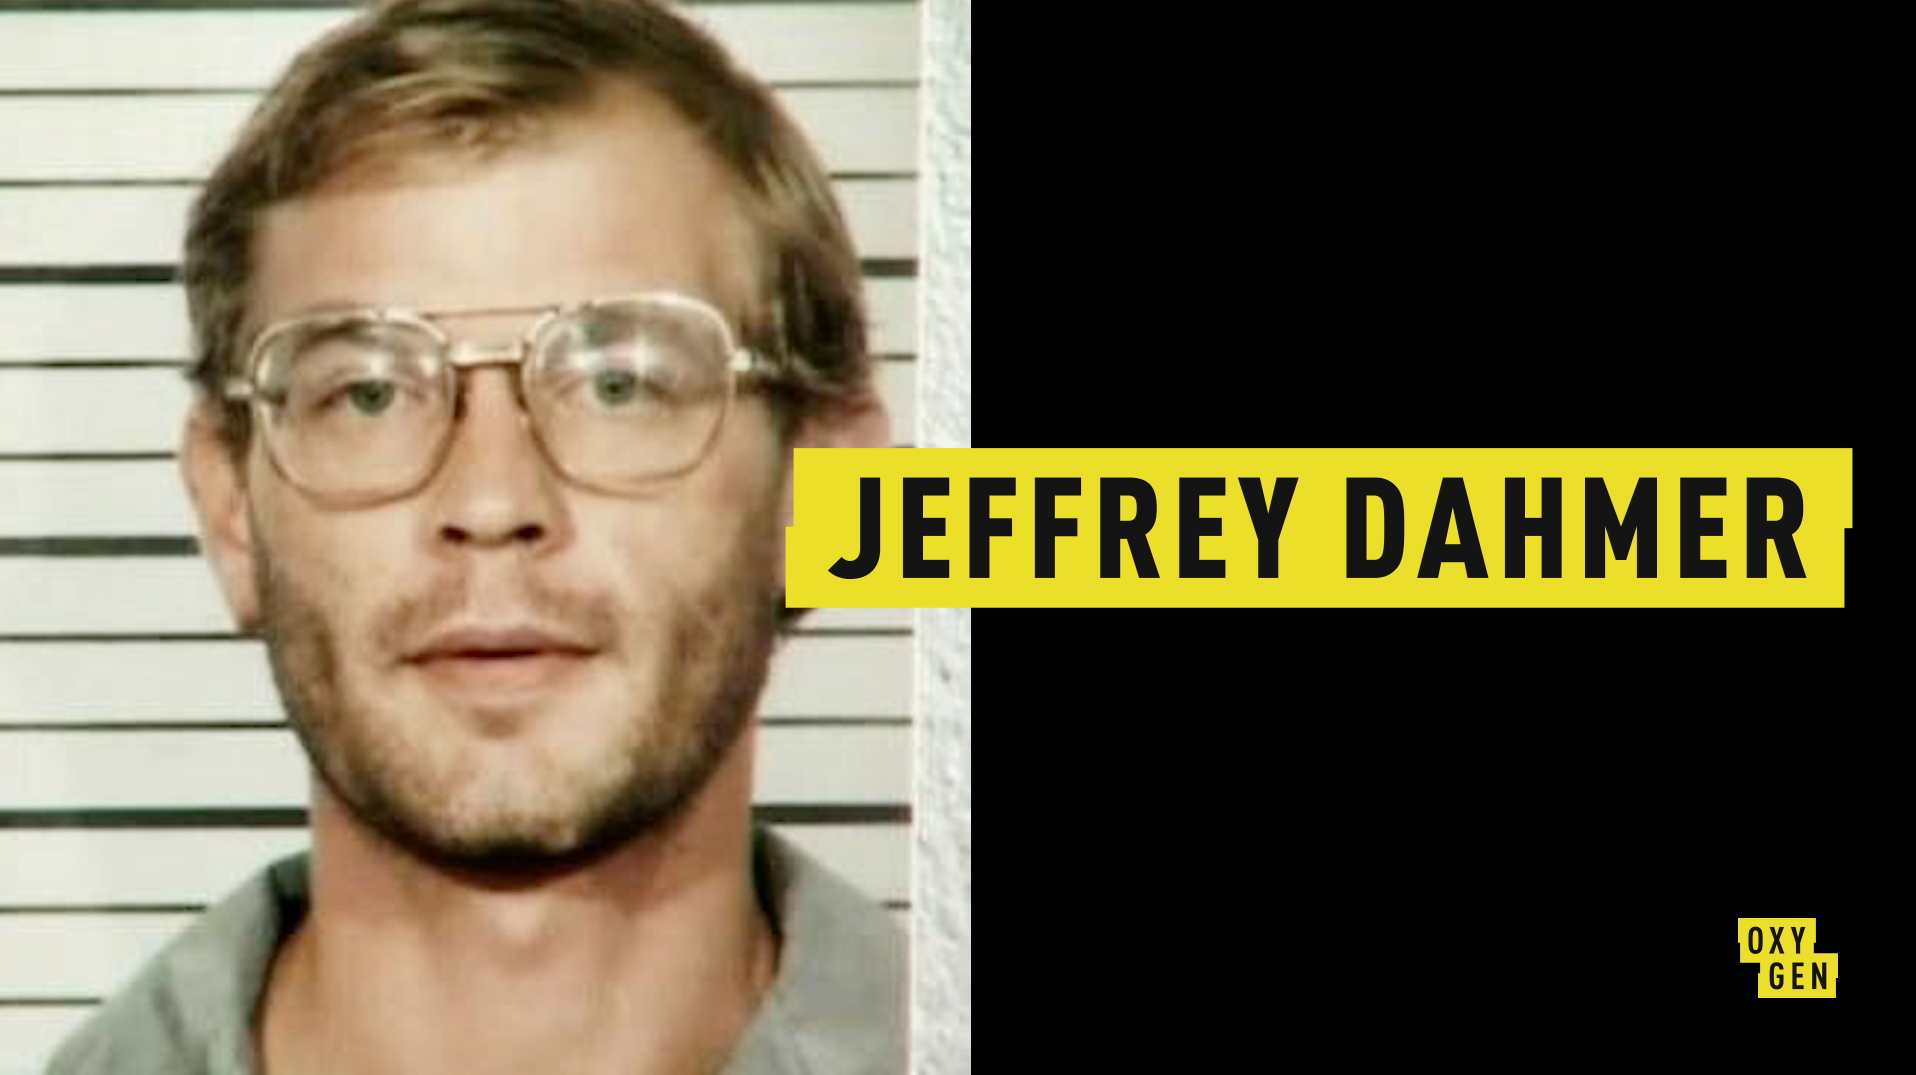 'Dahmer On Dahmer: A Serial Killer Speaks' har premiere 11. november om ilt